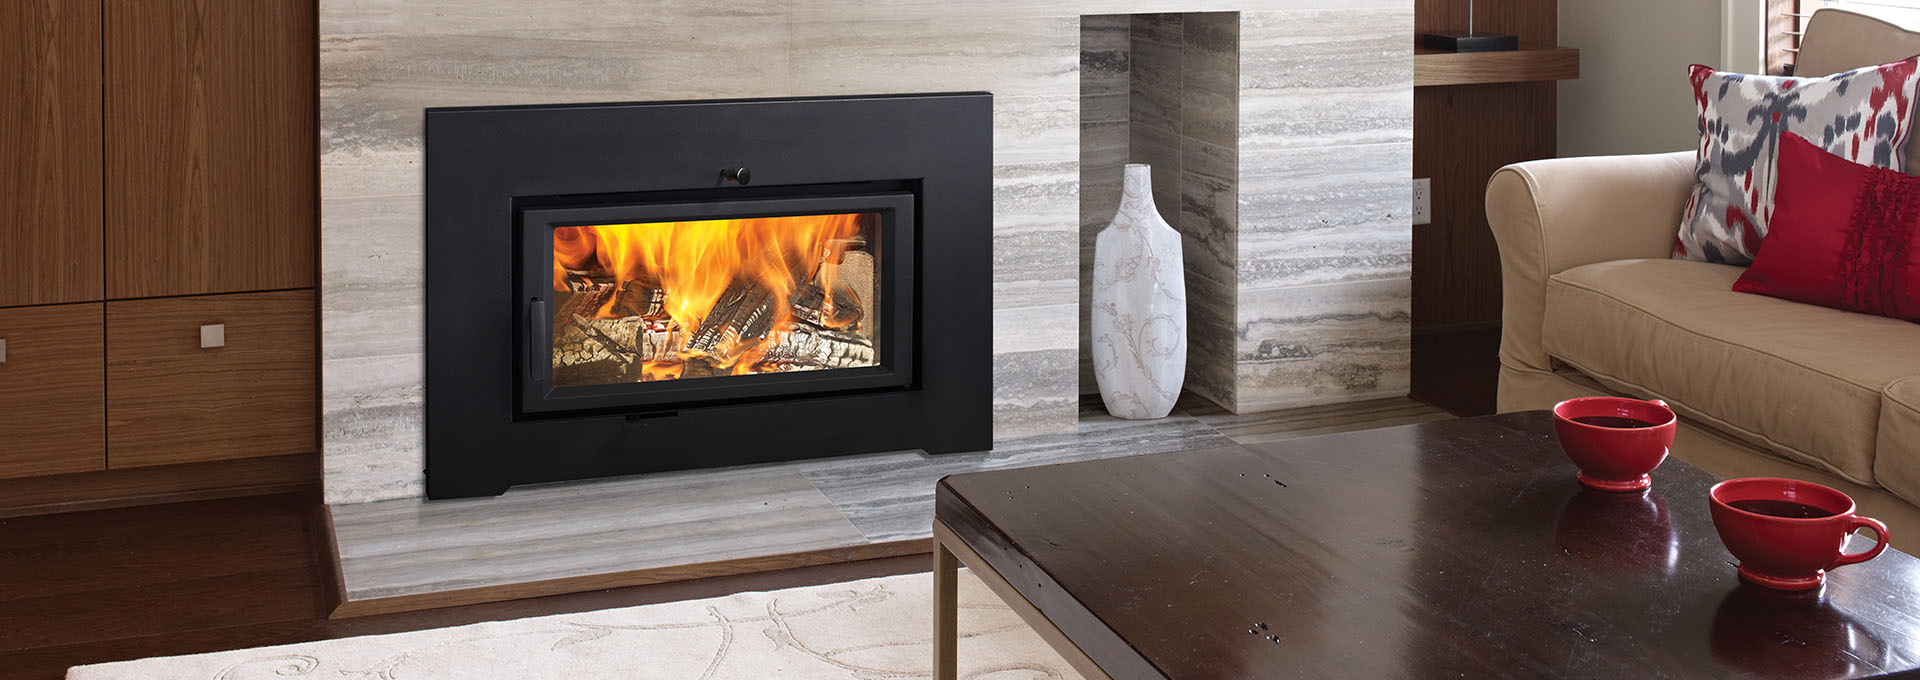 Rocky Mountain Stove Fireplace